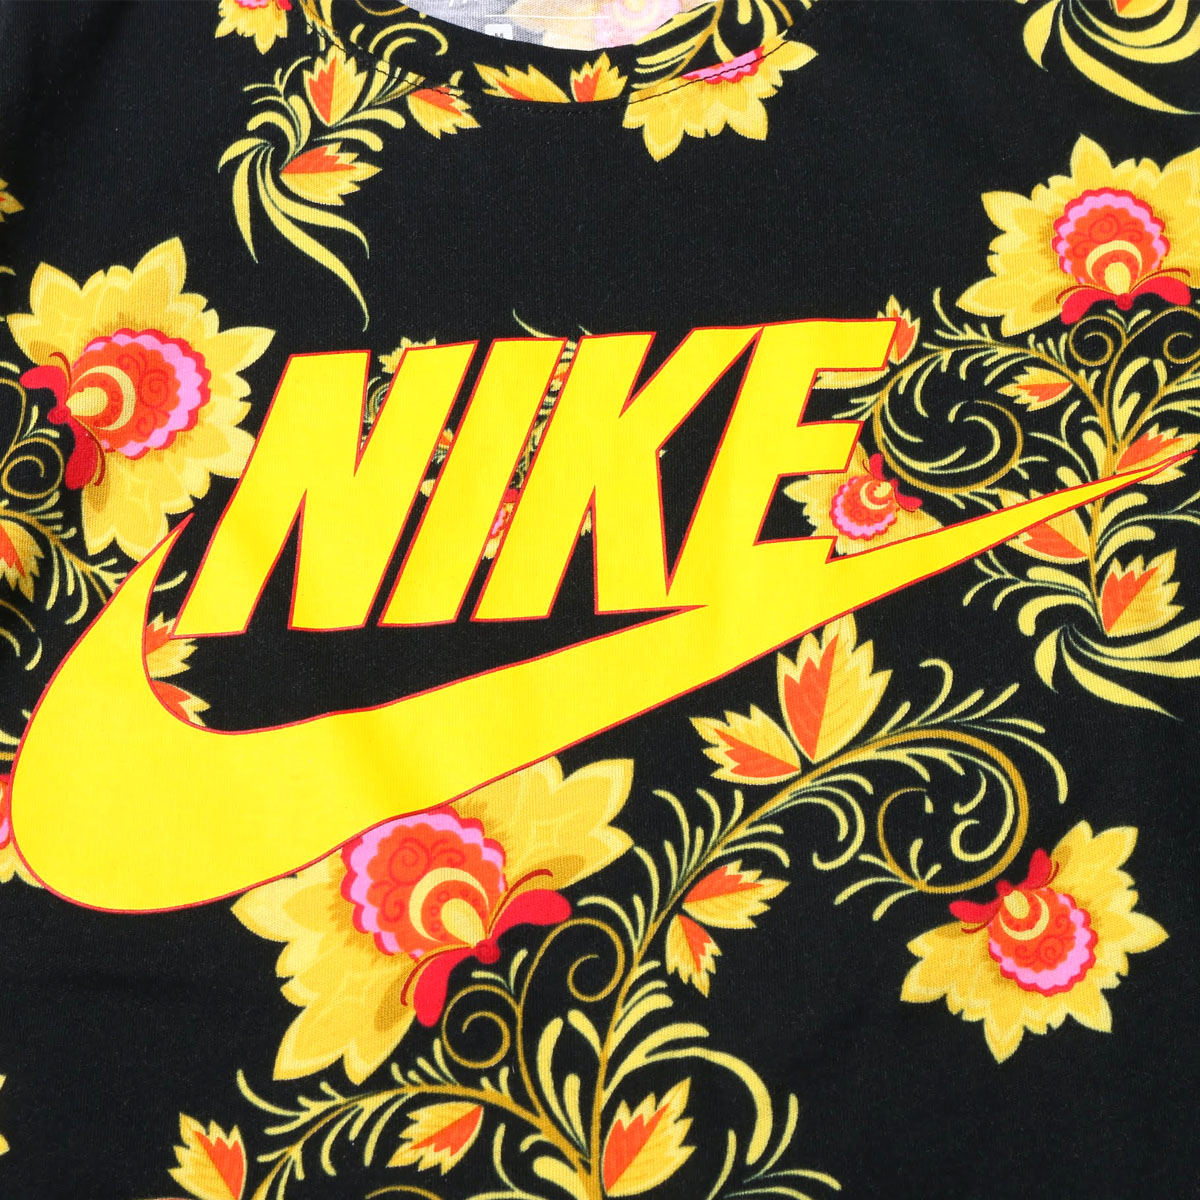 288bd78a8867 NIKEASMNSWTEECNCPTRED1(ナイキコンセプトレッドTシャツ1)BLACK TOURYELLOW メンズTシャツ